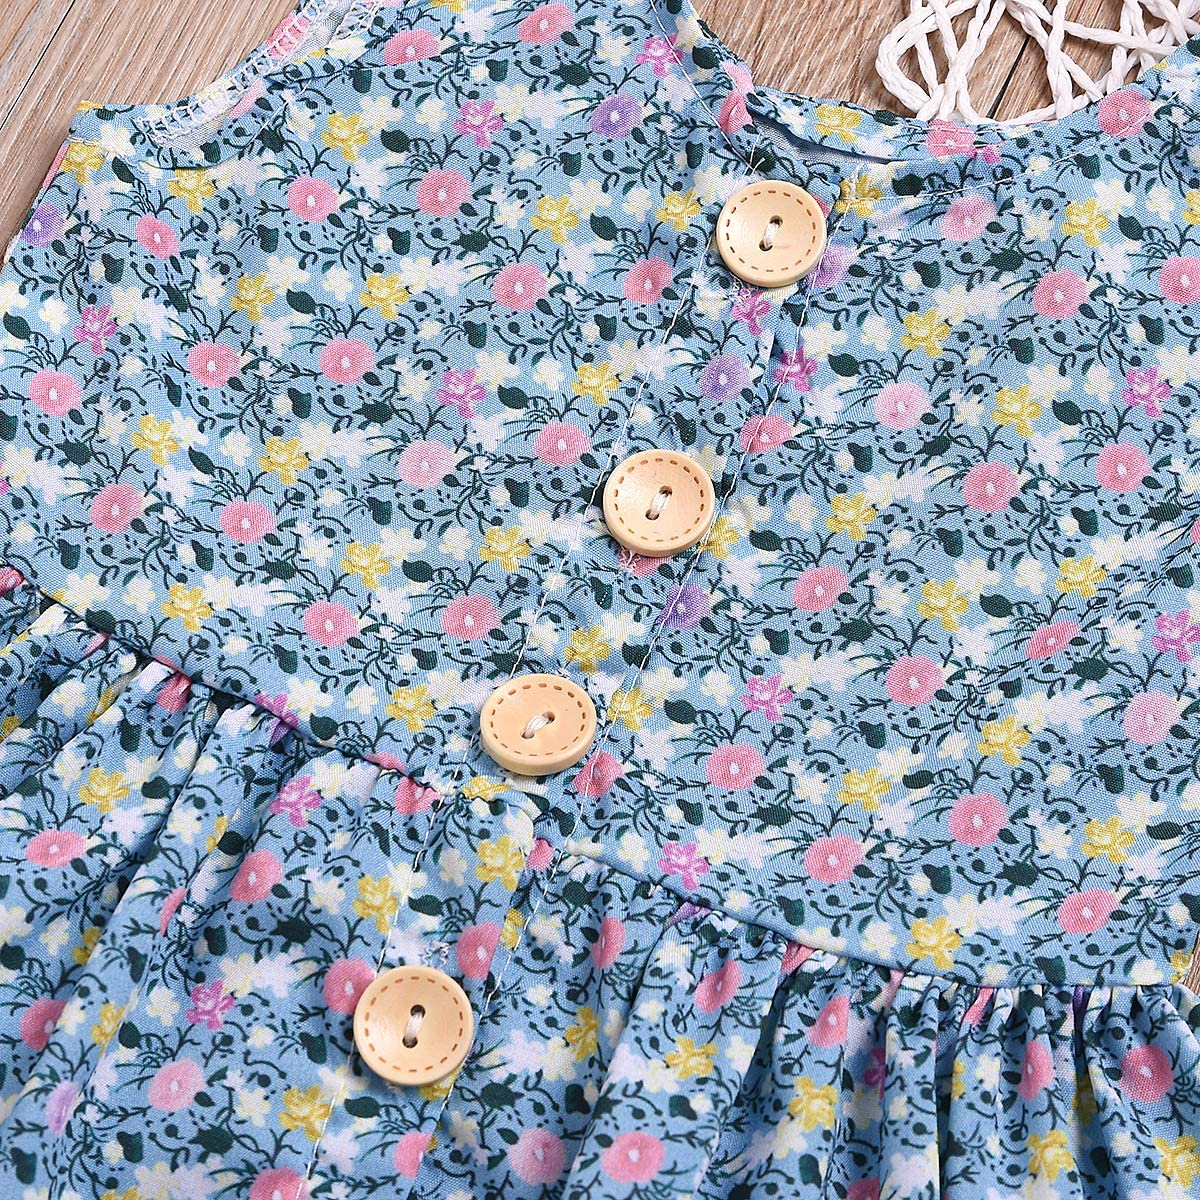 Kids Toddler/Baby Girls Shorts Outfits Set Floral Print Ruffle Dress Shirt Tops+Short Pants Summer Dresses 3Pc Clothes Set